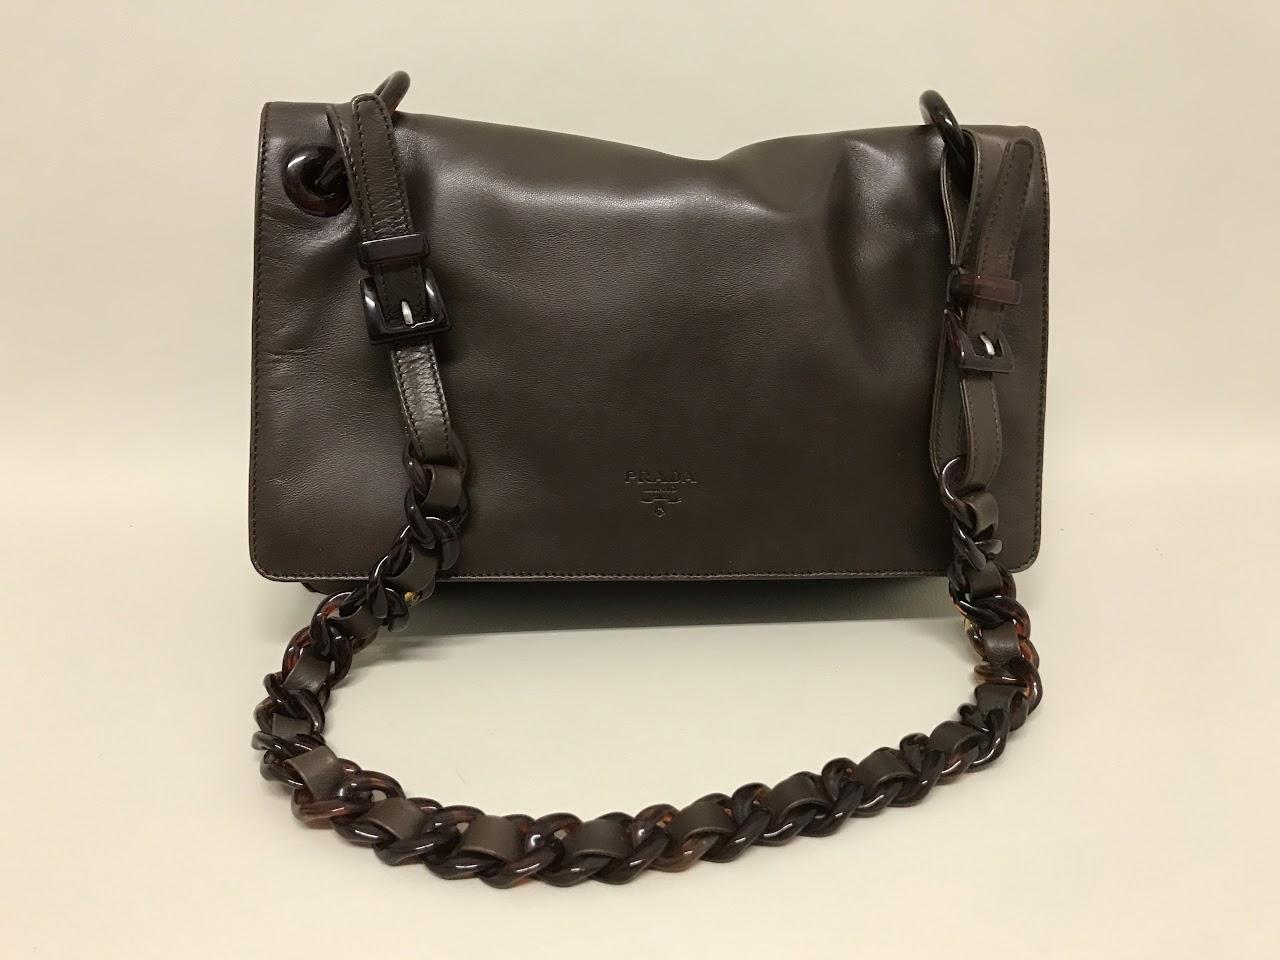 02842eea Prada Chocolate Brown Handbag - Bag Photos and Wallpaper HD